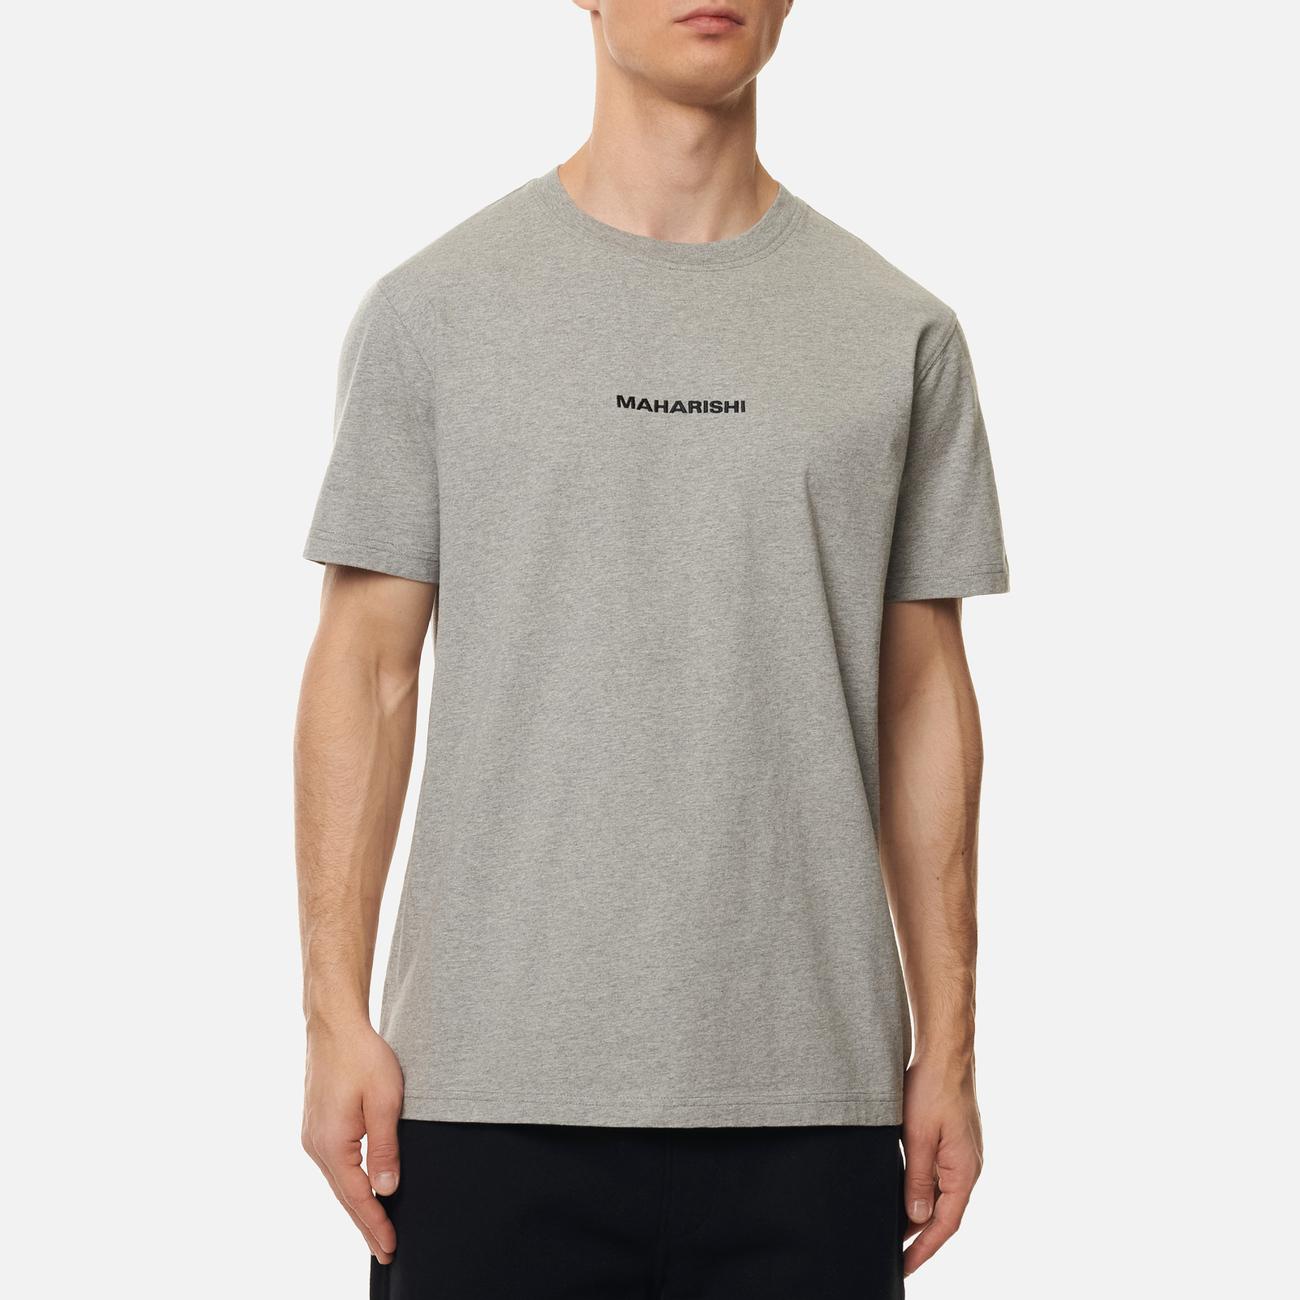 Мужская футболка maharishi Organic Military Type Embroidery Grey Marl